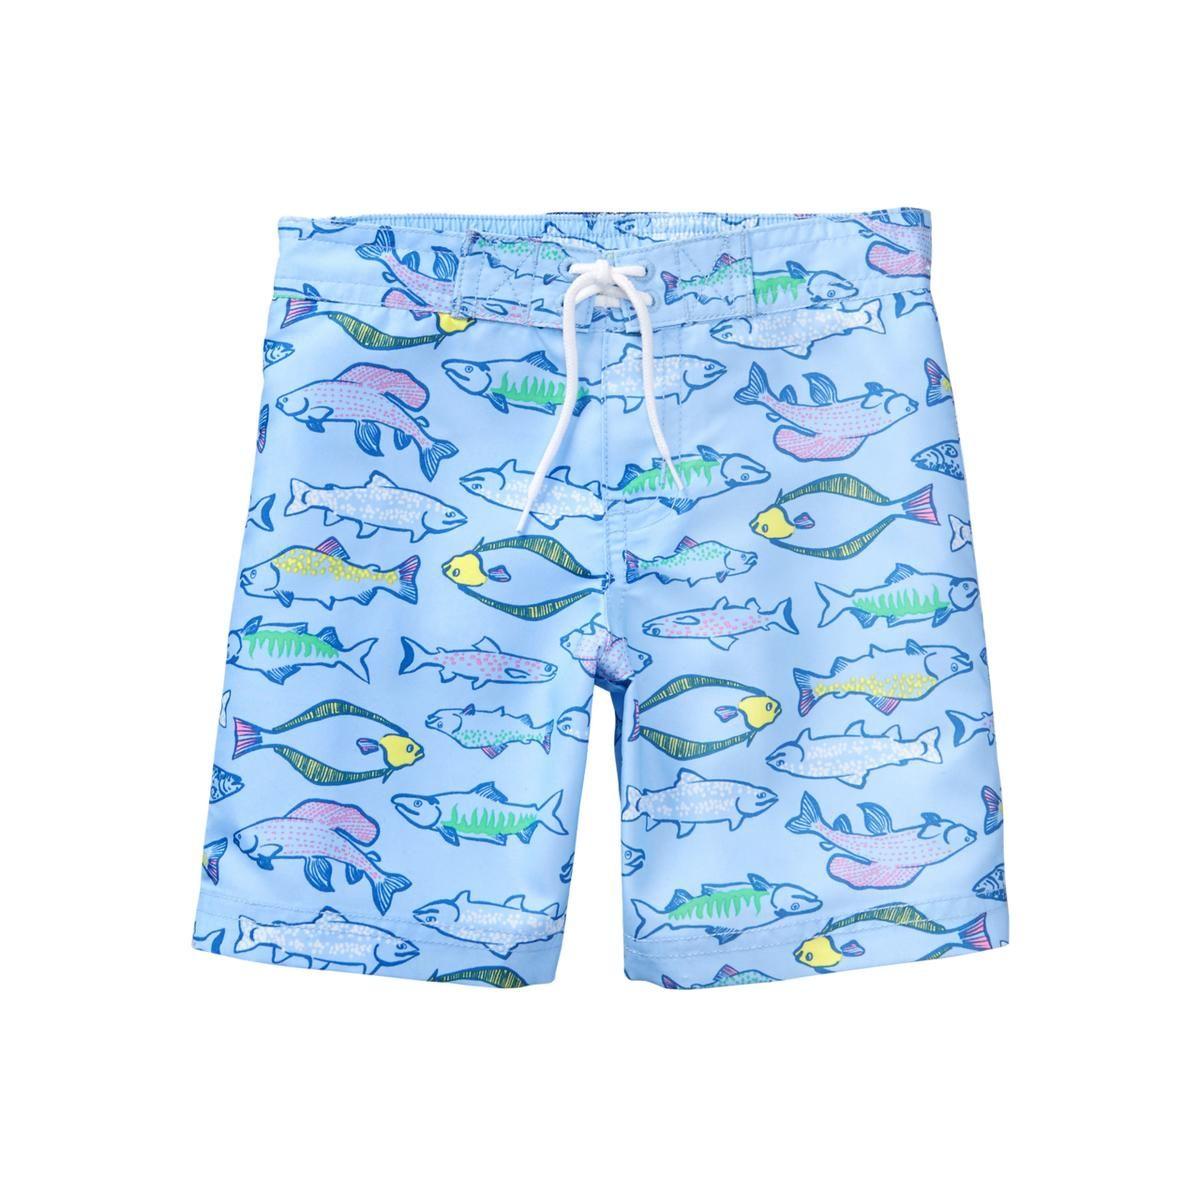 a9d42bbb61 Fish Swim Trunk | SWIM | Swim trunks, Baby boy swimwear, Fish swimming